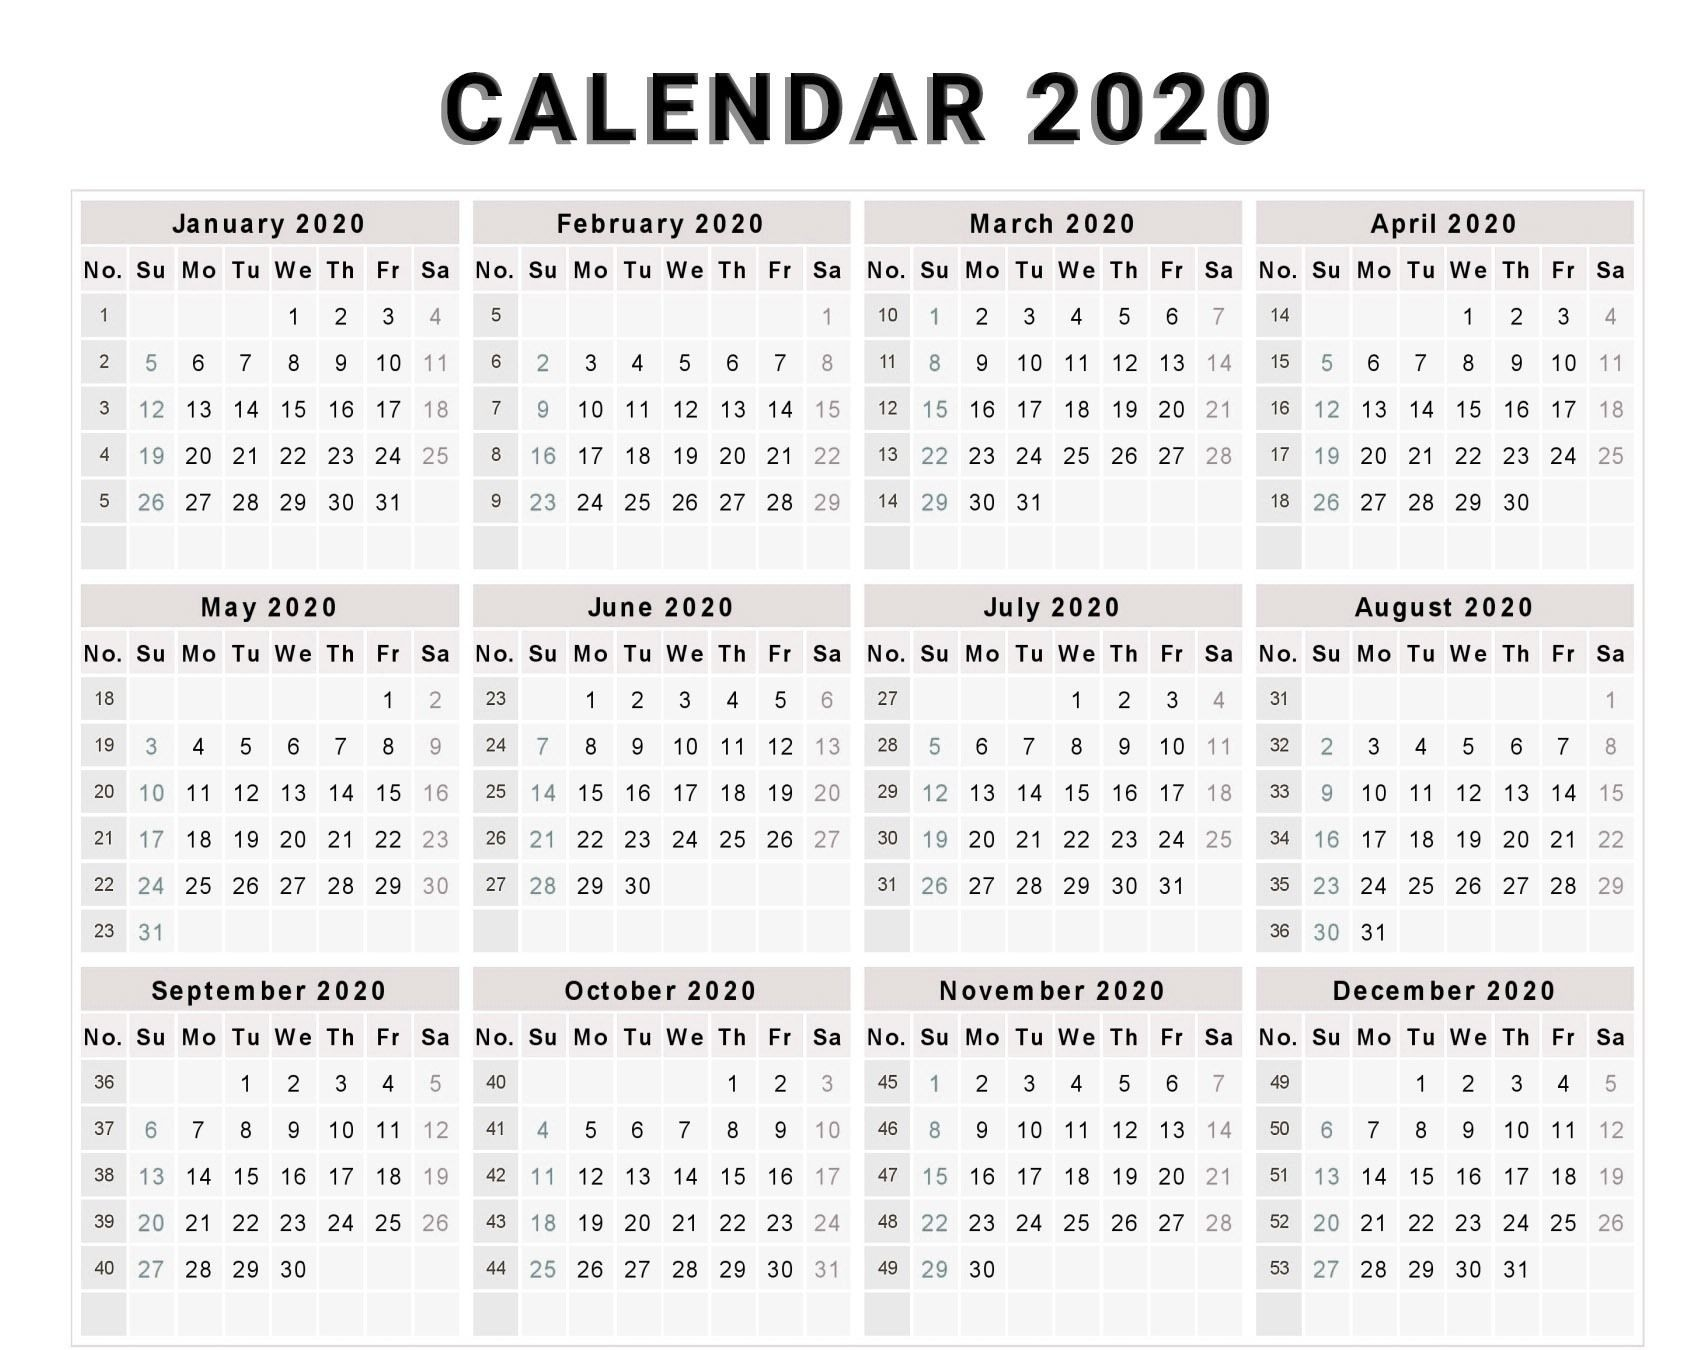 Calendar 2020 Free Template With Weeks | Monthly Calendar-Microsoft Word Template 2020 Calendar